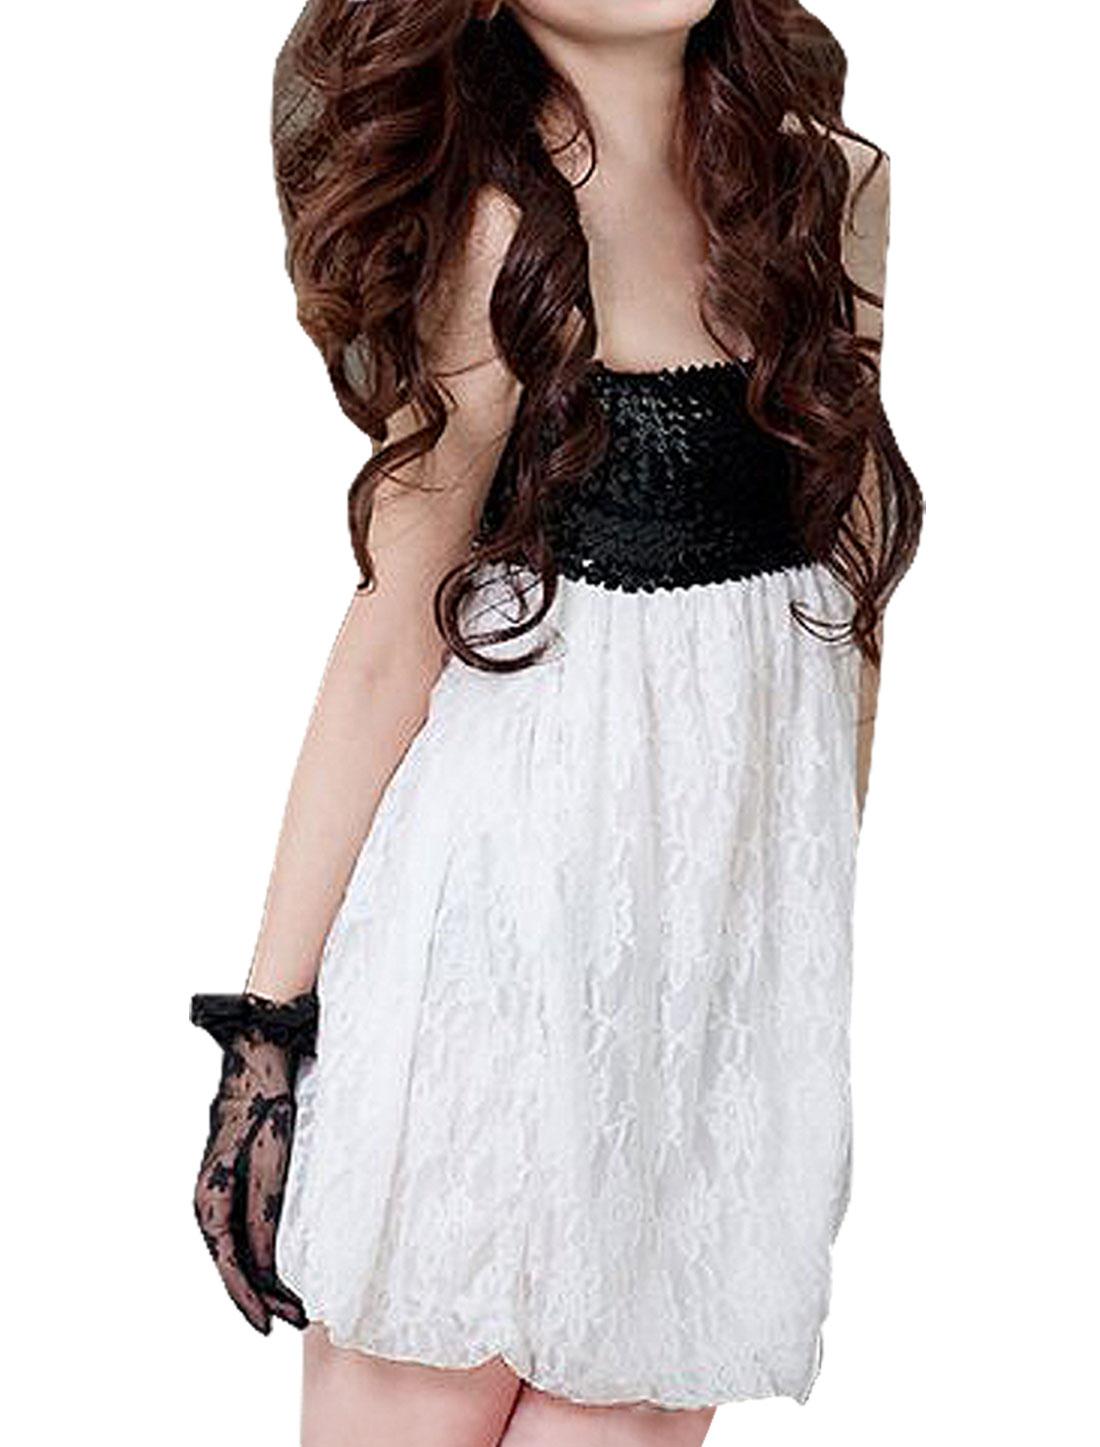 Ladies Strapless Sequin Upper Elastic Top Semi Sheer Dress White XS